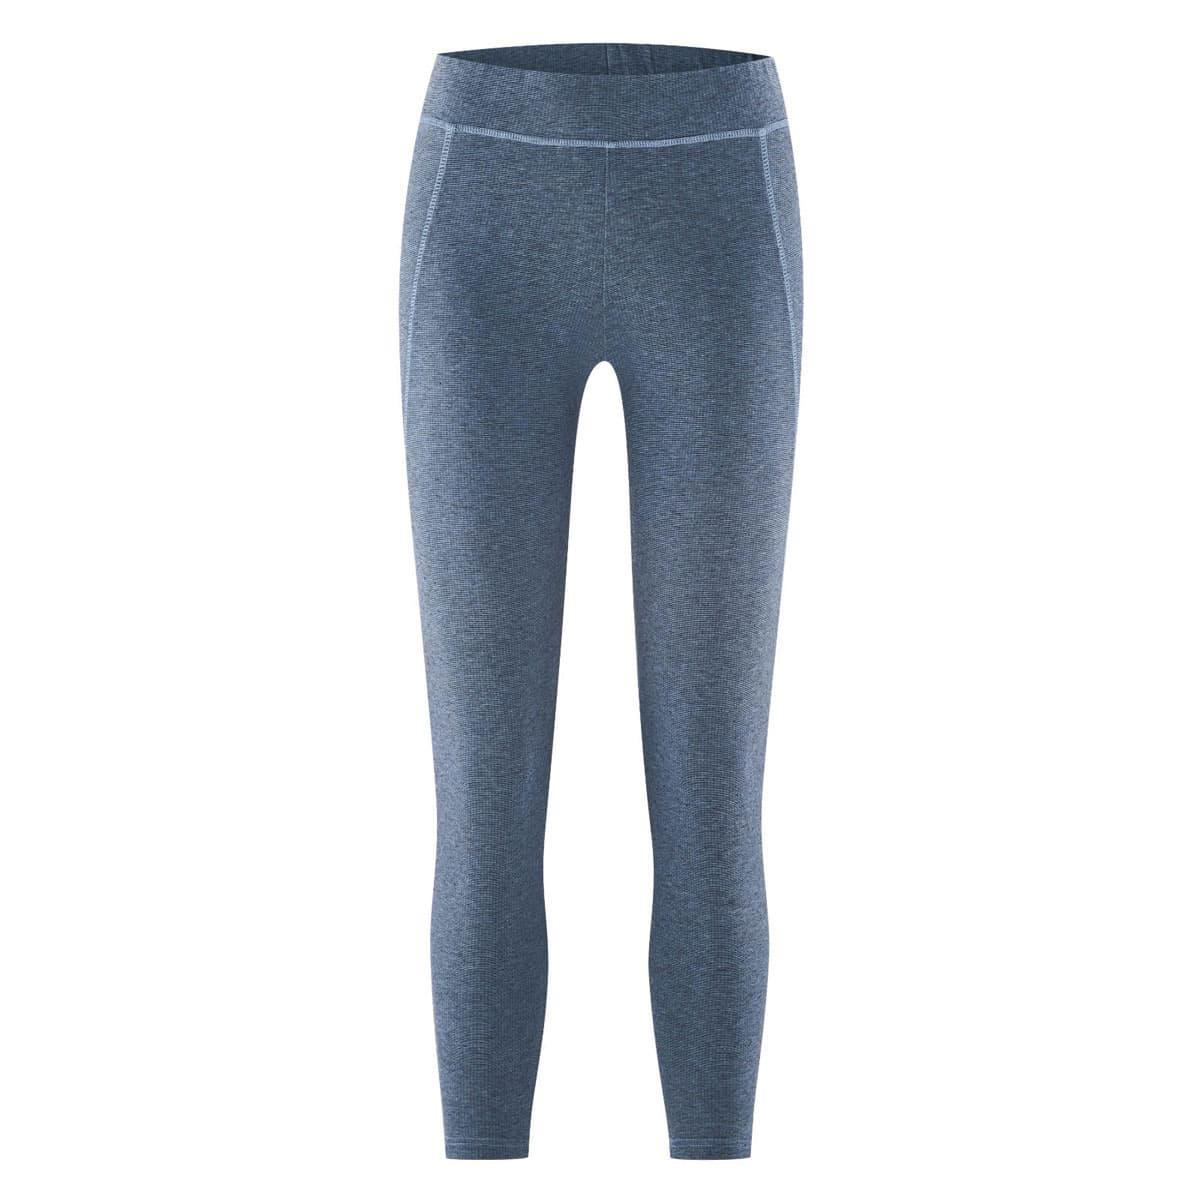 Mallas yoga azul algodón orgánico